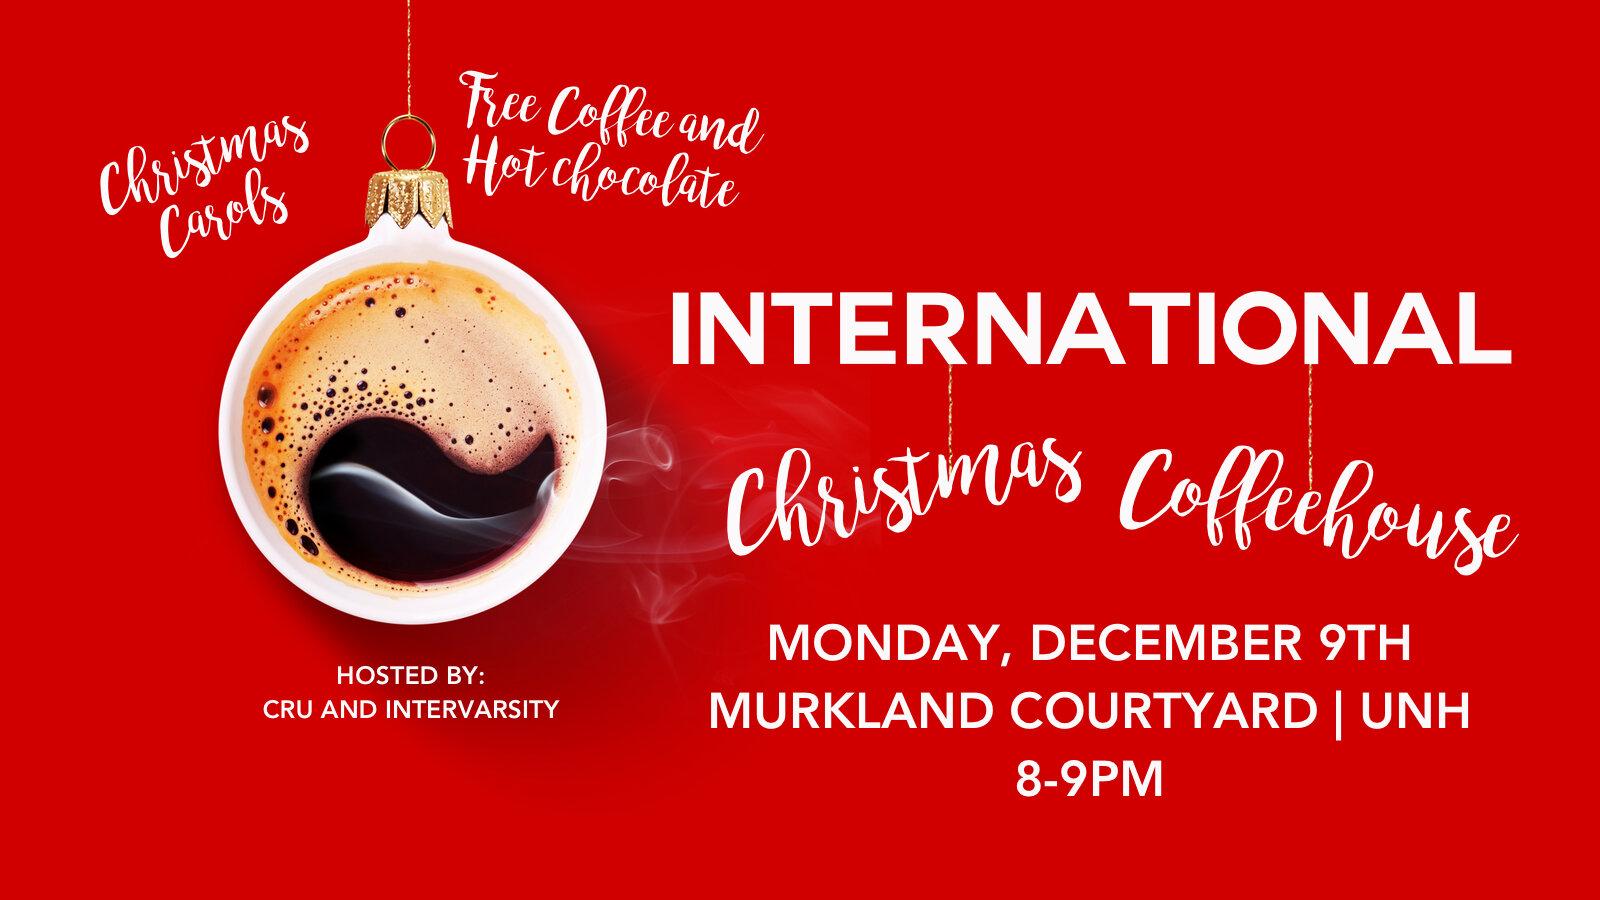 International Christmas Coffeehouse Durham Evangelical Church